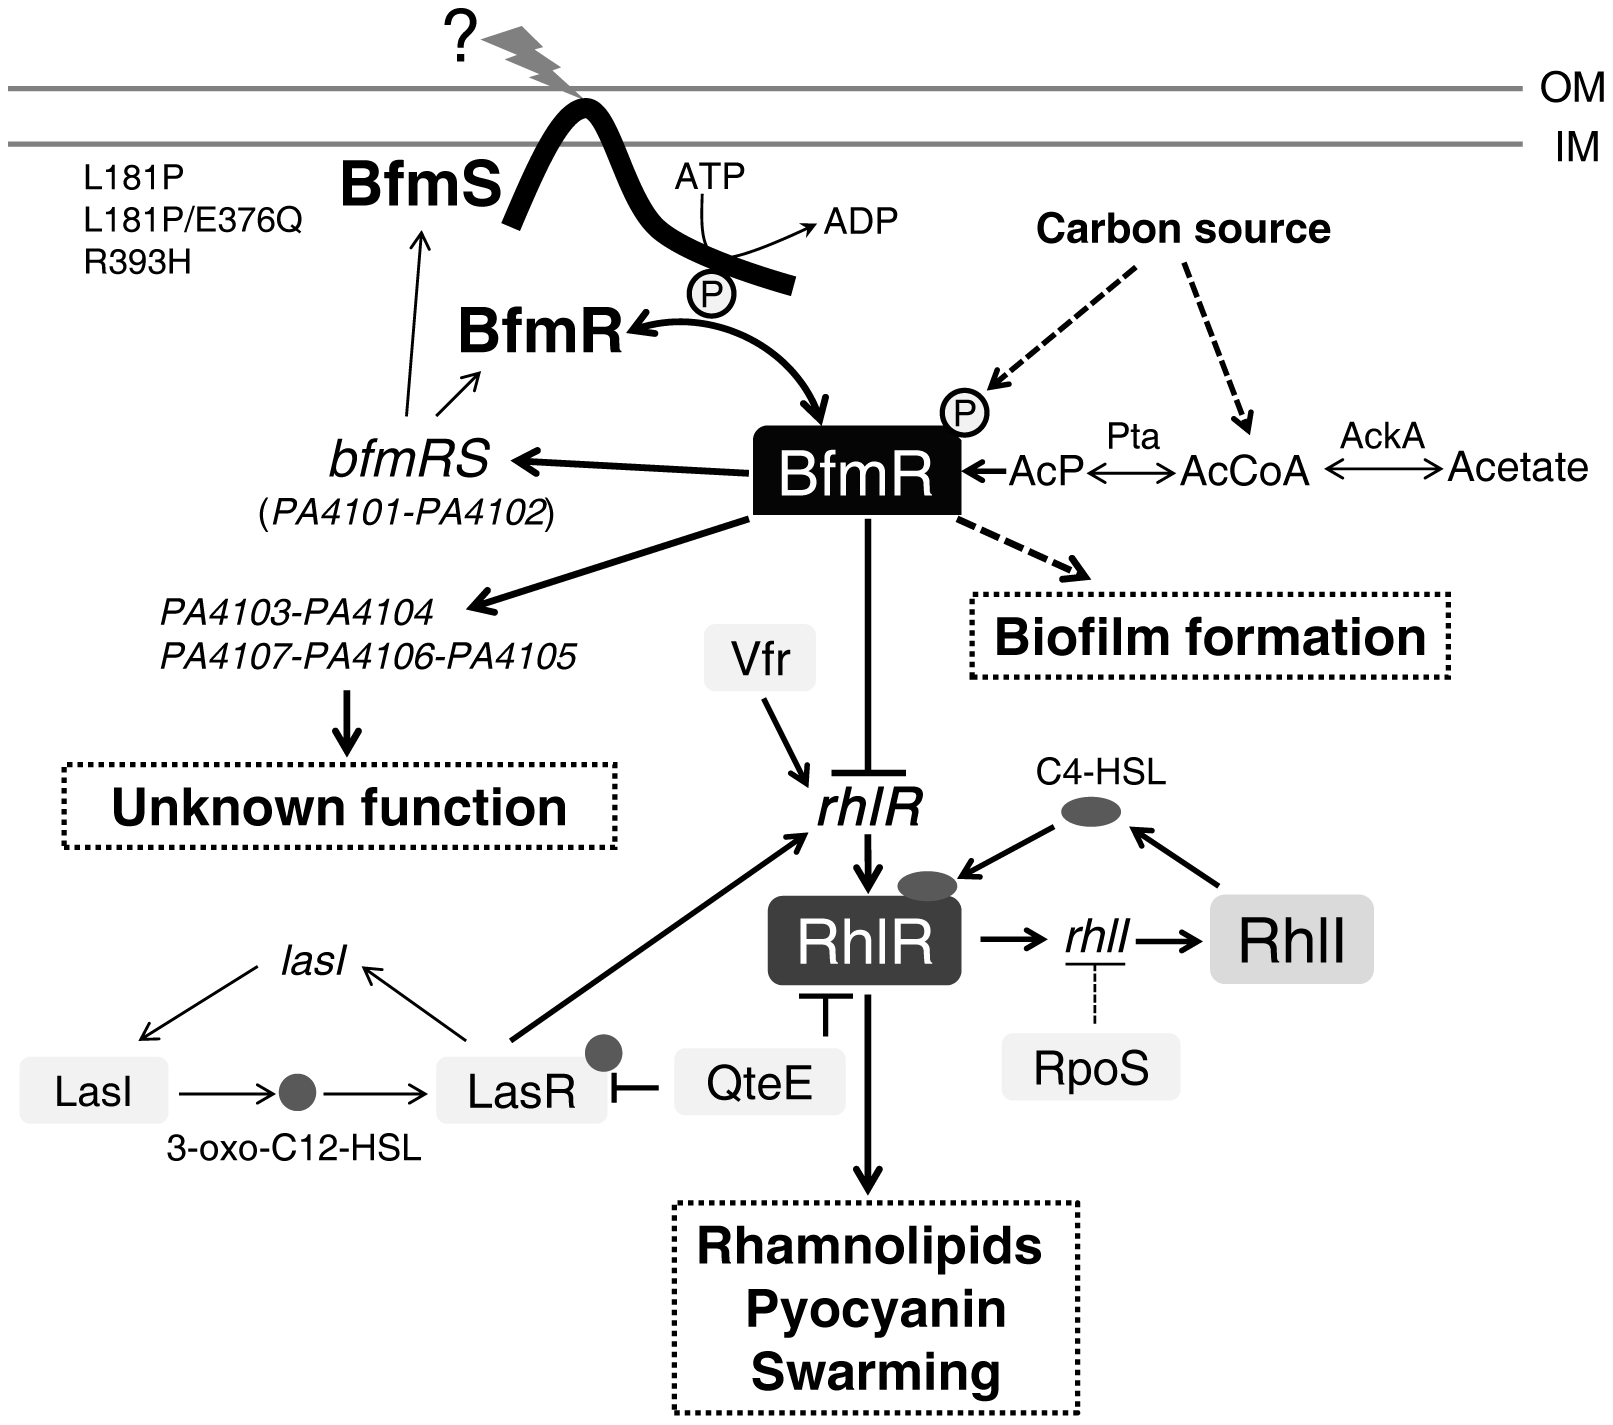 Model of the regulatory networks involving BfmRS in <i>P. aeruginosa</i>.